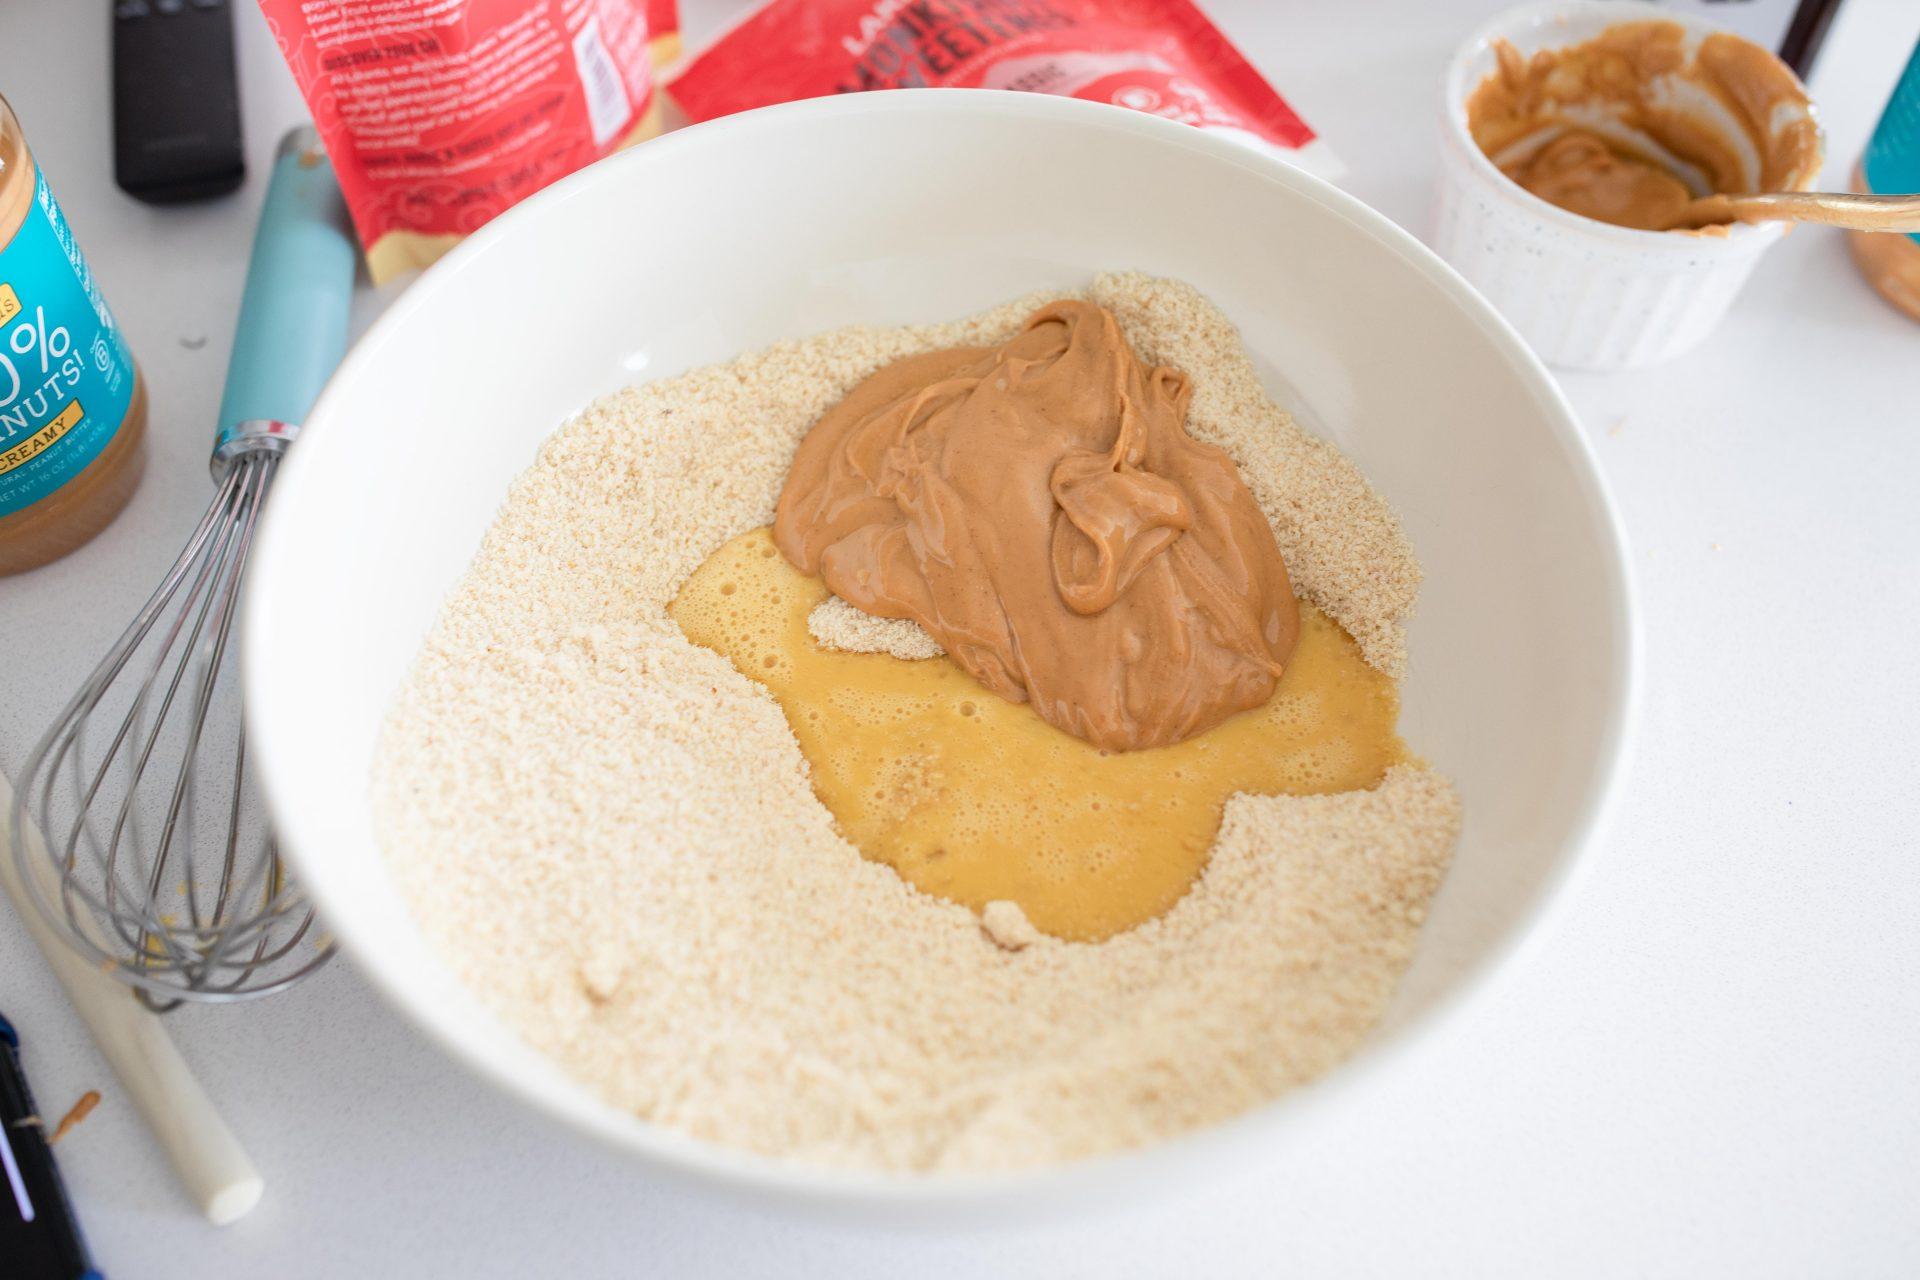 peanut butter cookies, healthy, keto, pb cookies, low carb, low carb cookies, peanut butter dessert, keto, diabetic-friendly, gluten-free, dairy-free, keto diet, healthy snack, sugar free, no added sugar